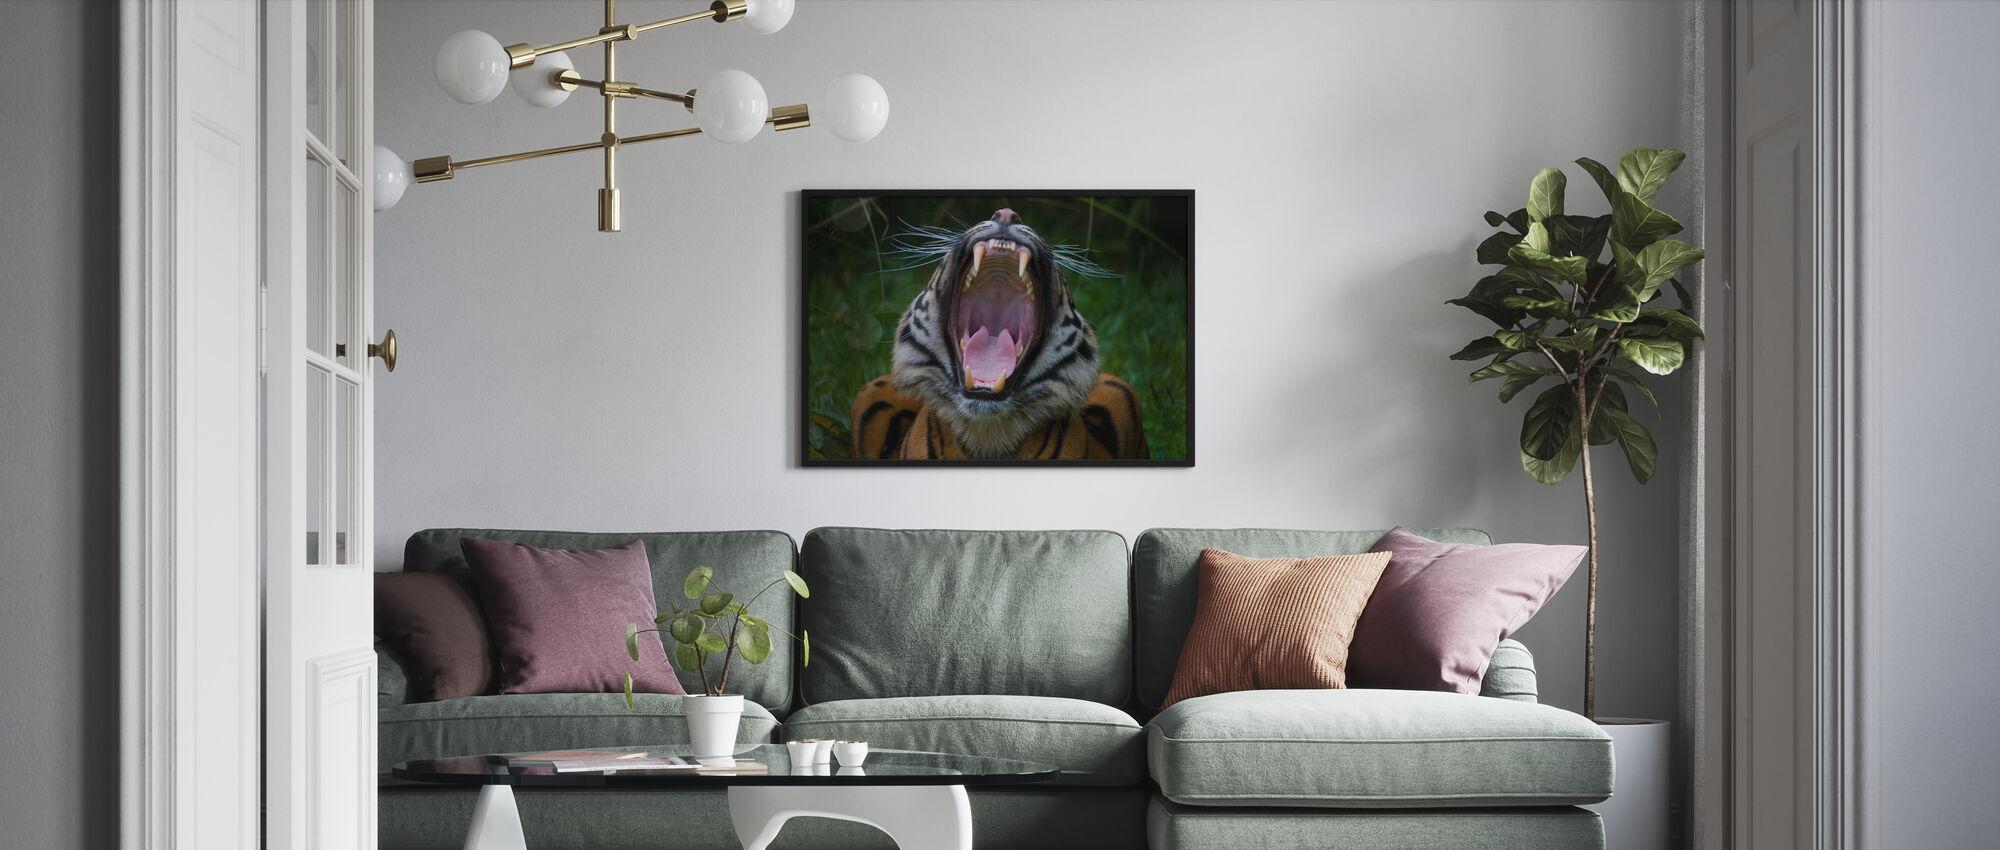 Yawning Tiger - Poster - Living Room